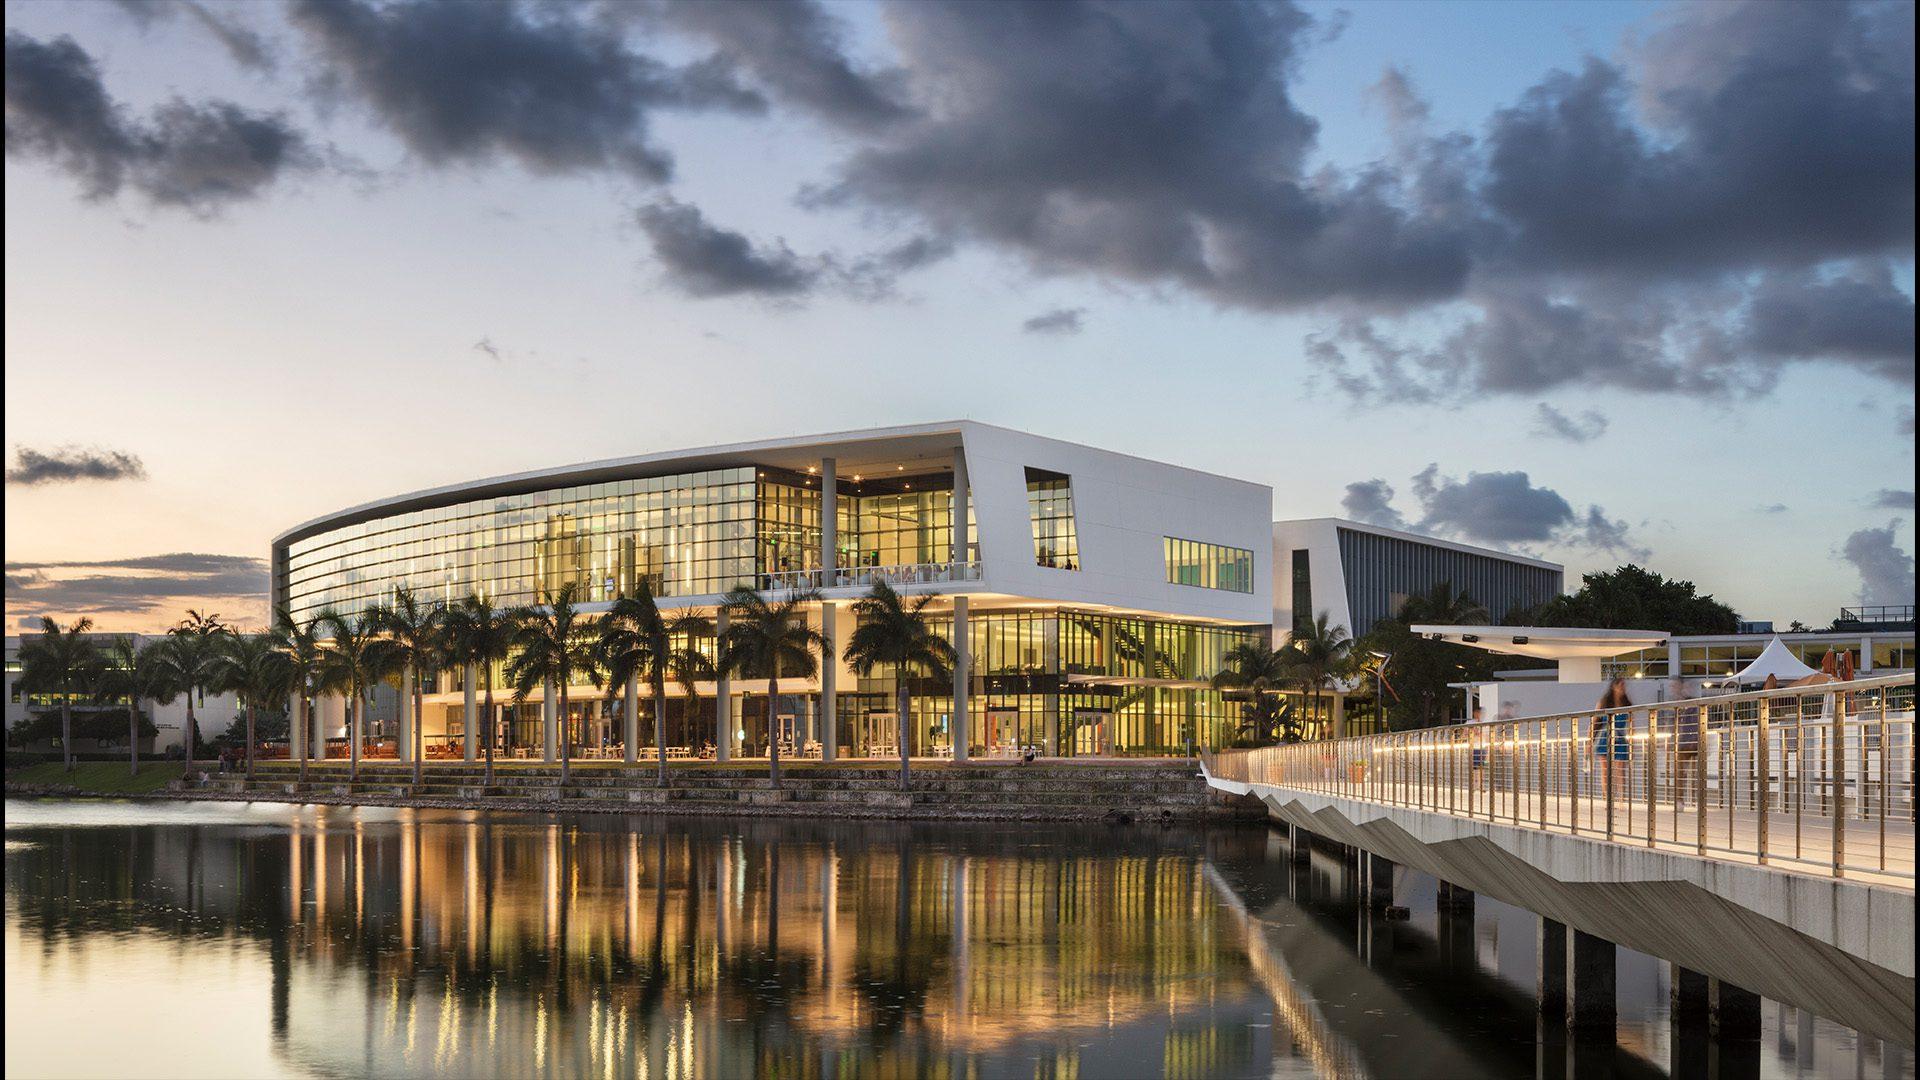 University_of_Miami_Student_Activity_Center_3_ft-1920x1080